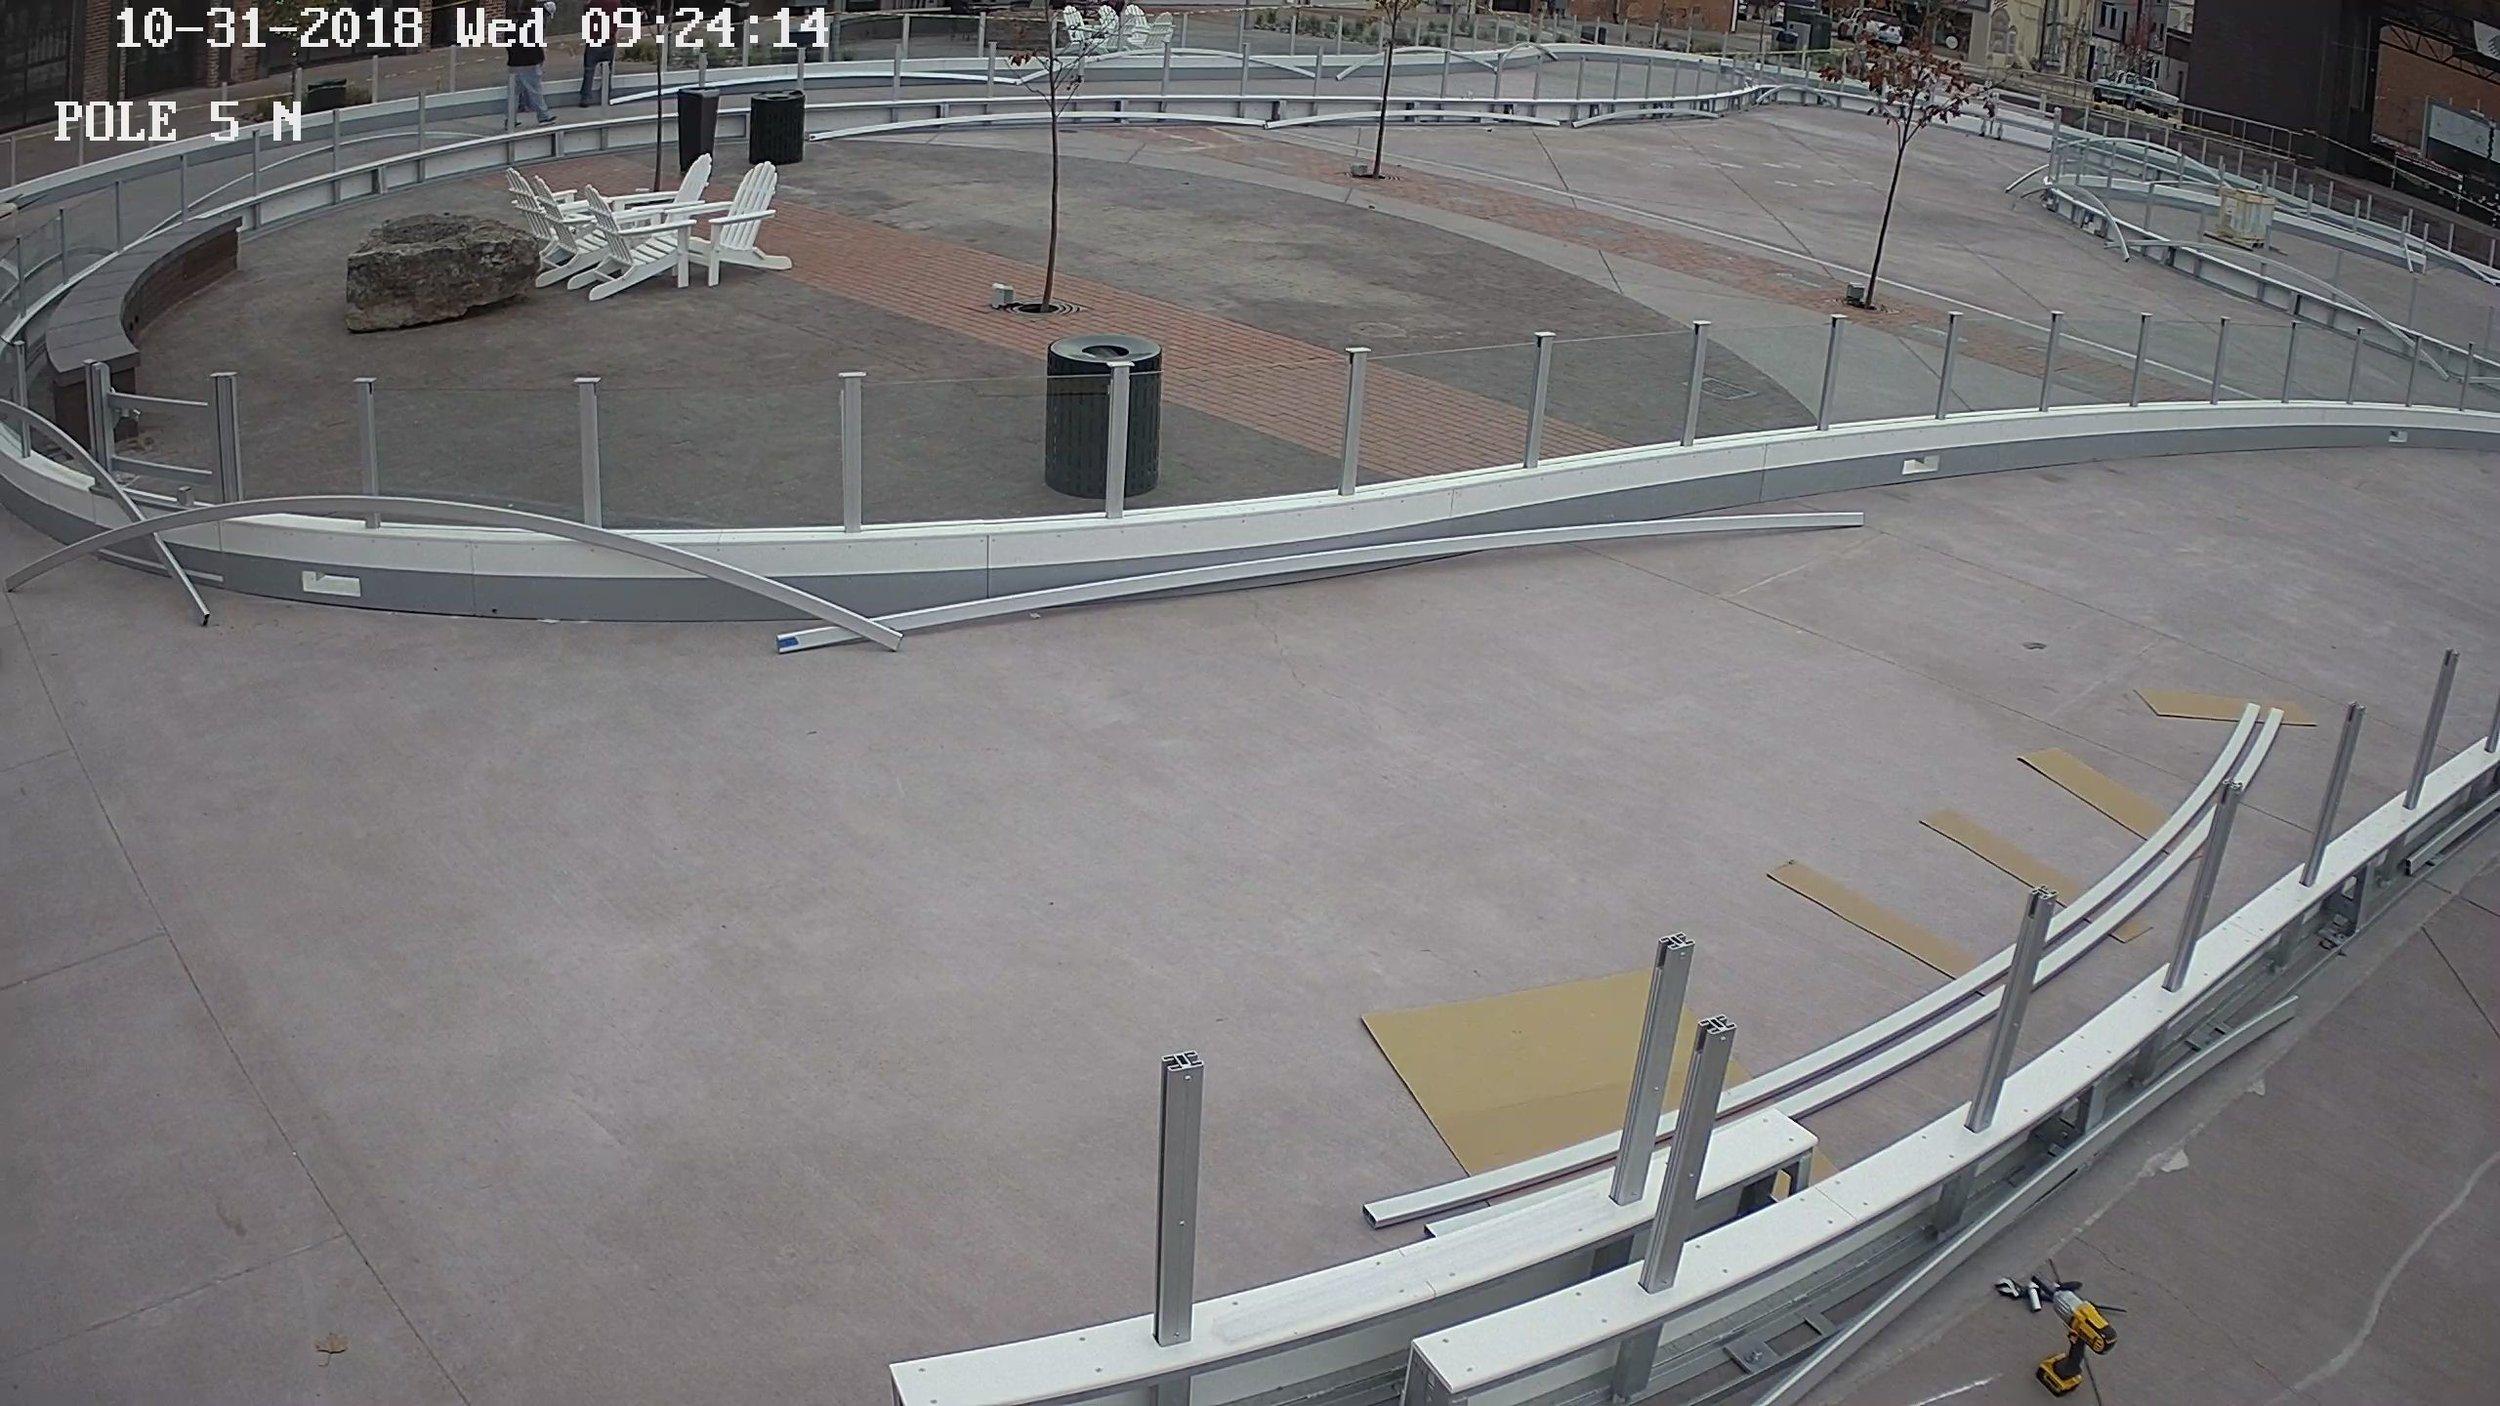 Plaza camera_IP Camera10_Plaza camera_20181031092415_162710.jpg